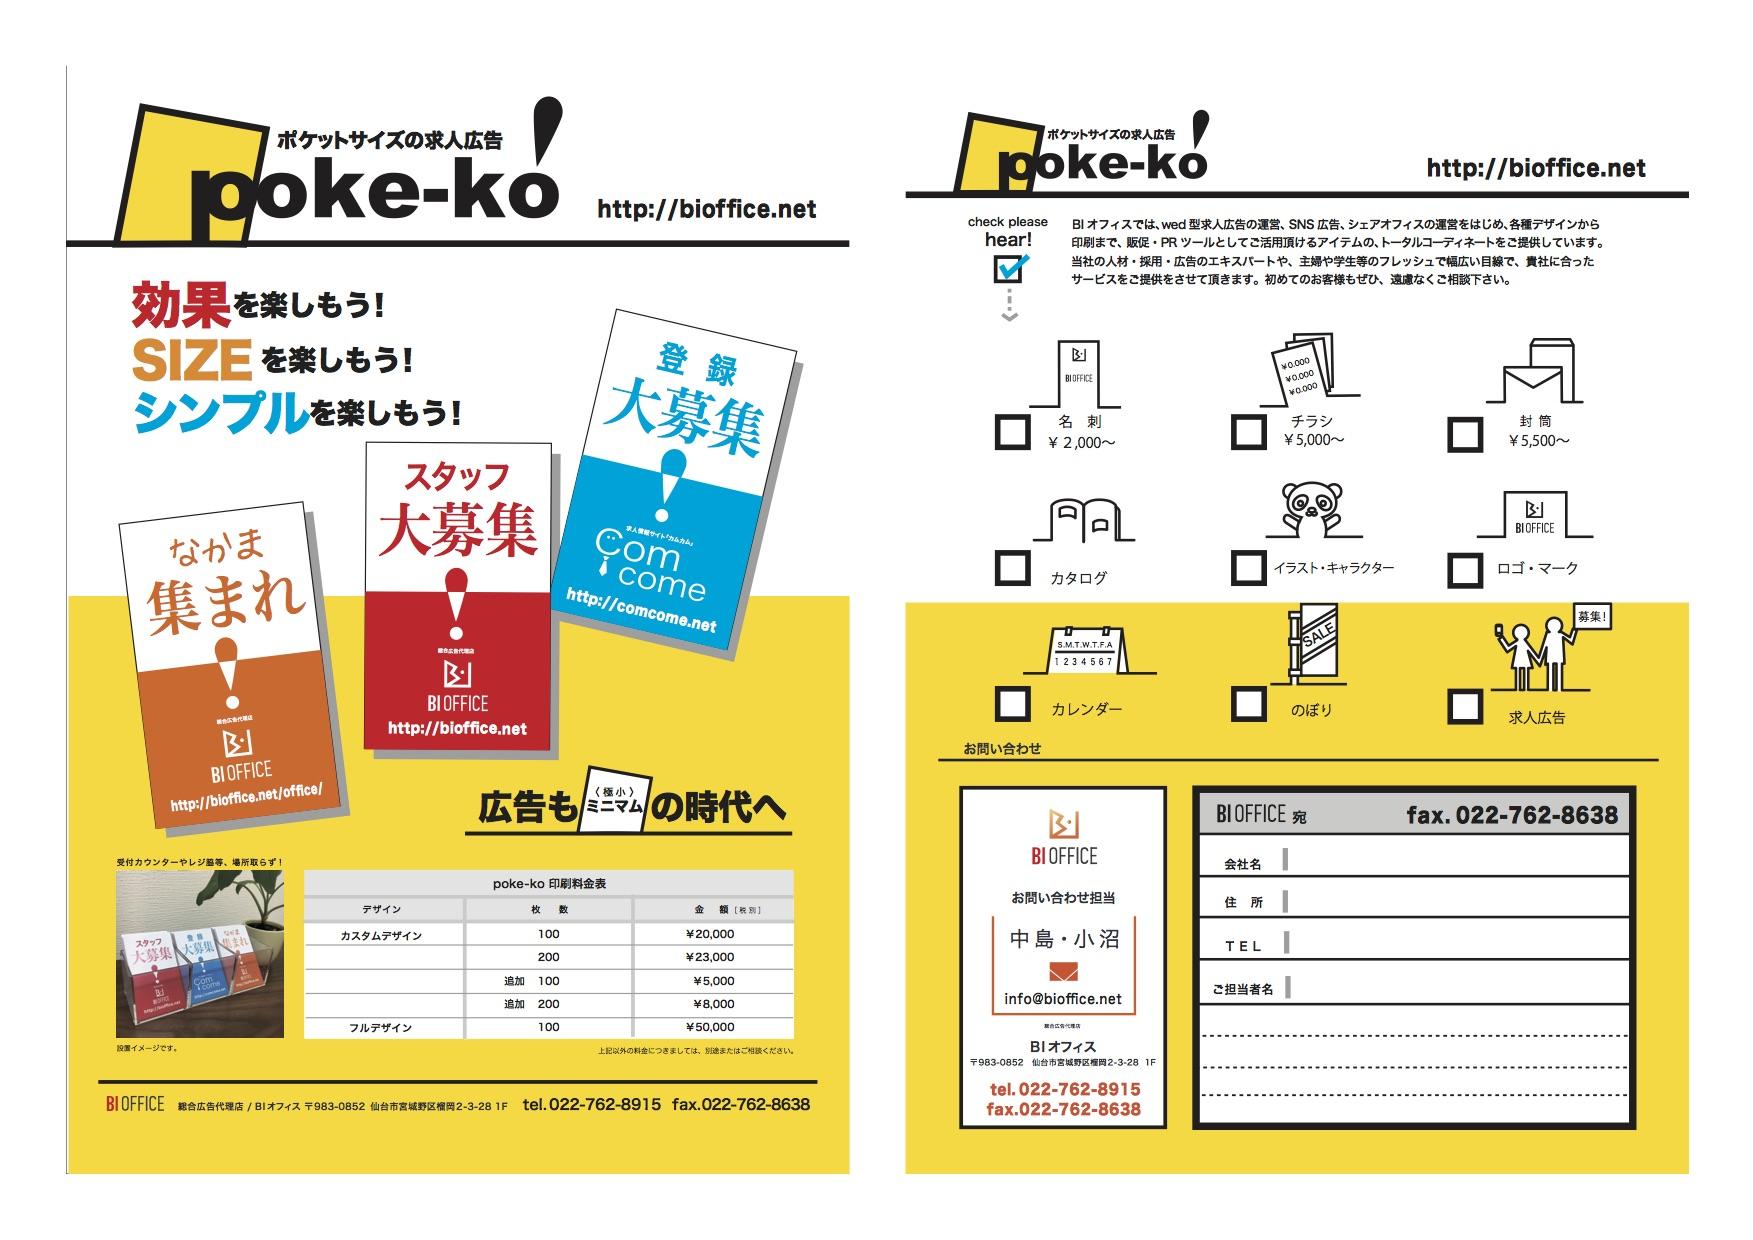 po-keko 両面 (jpeg)